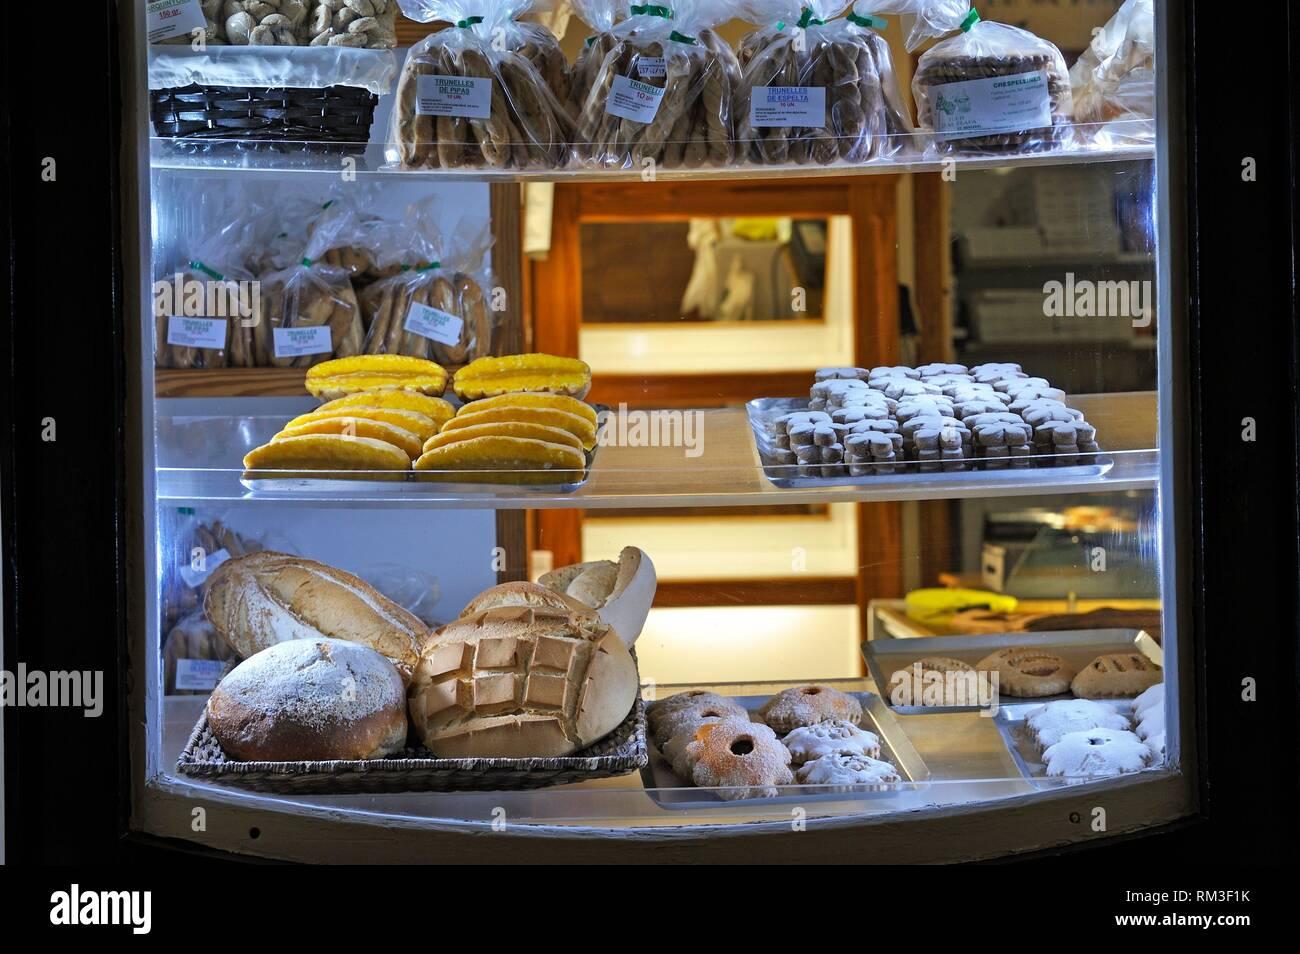 Shop window of the bakery Forn de Sa Placa, city of Es Mercadal, Menorca, Balearic Islands, Spain, Europe. - Stock Image